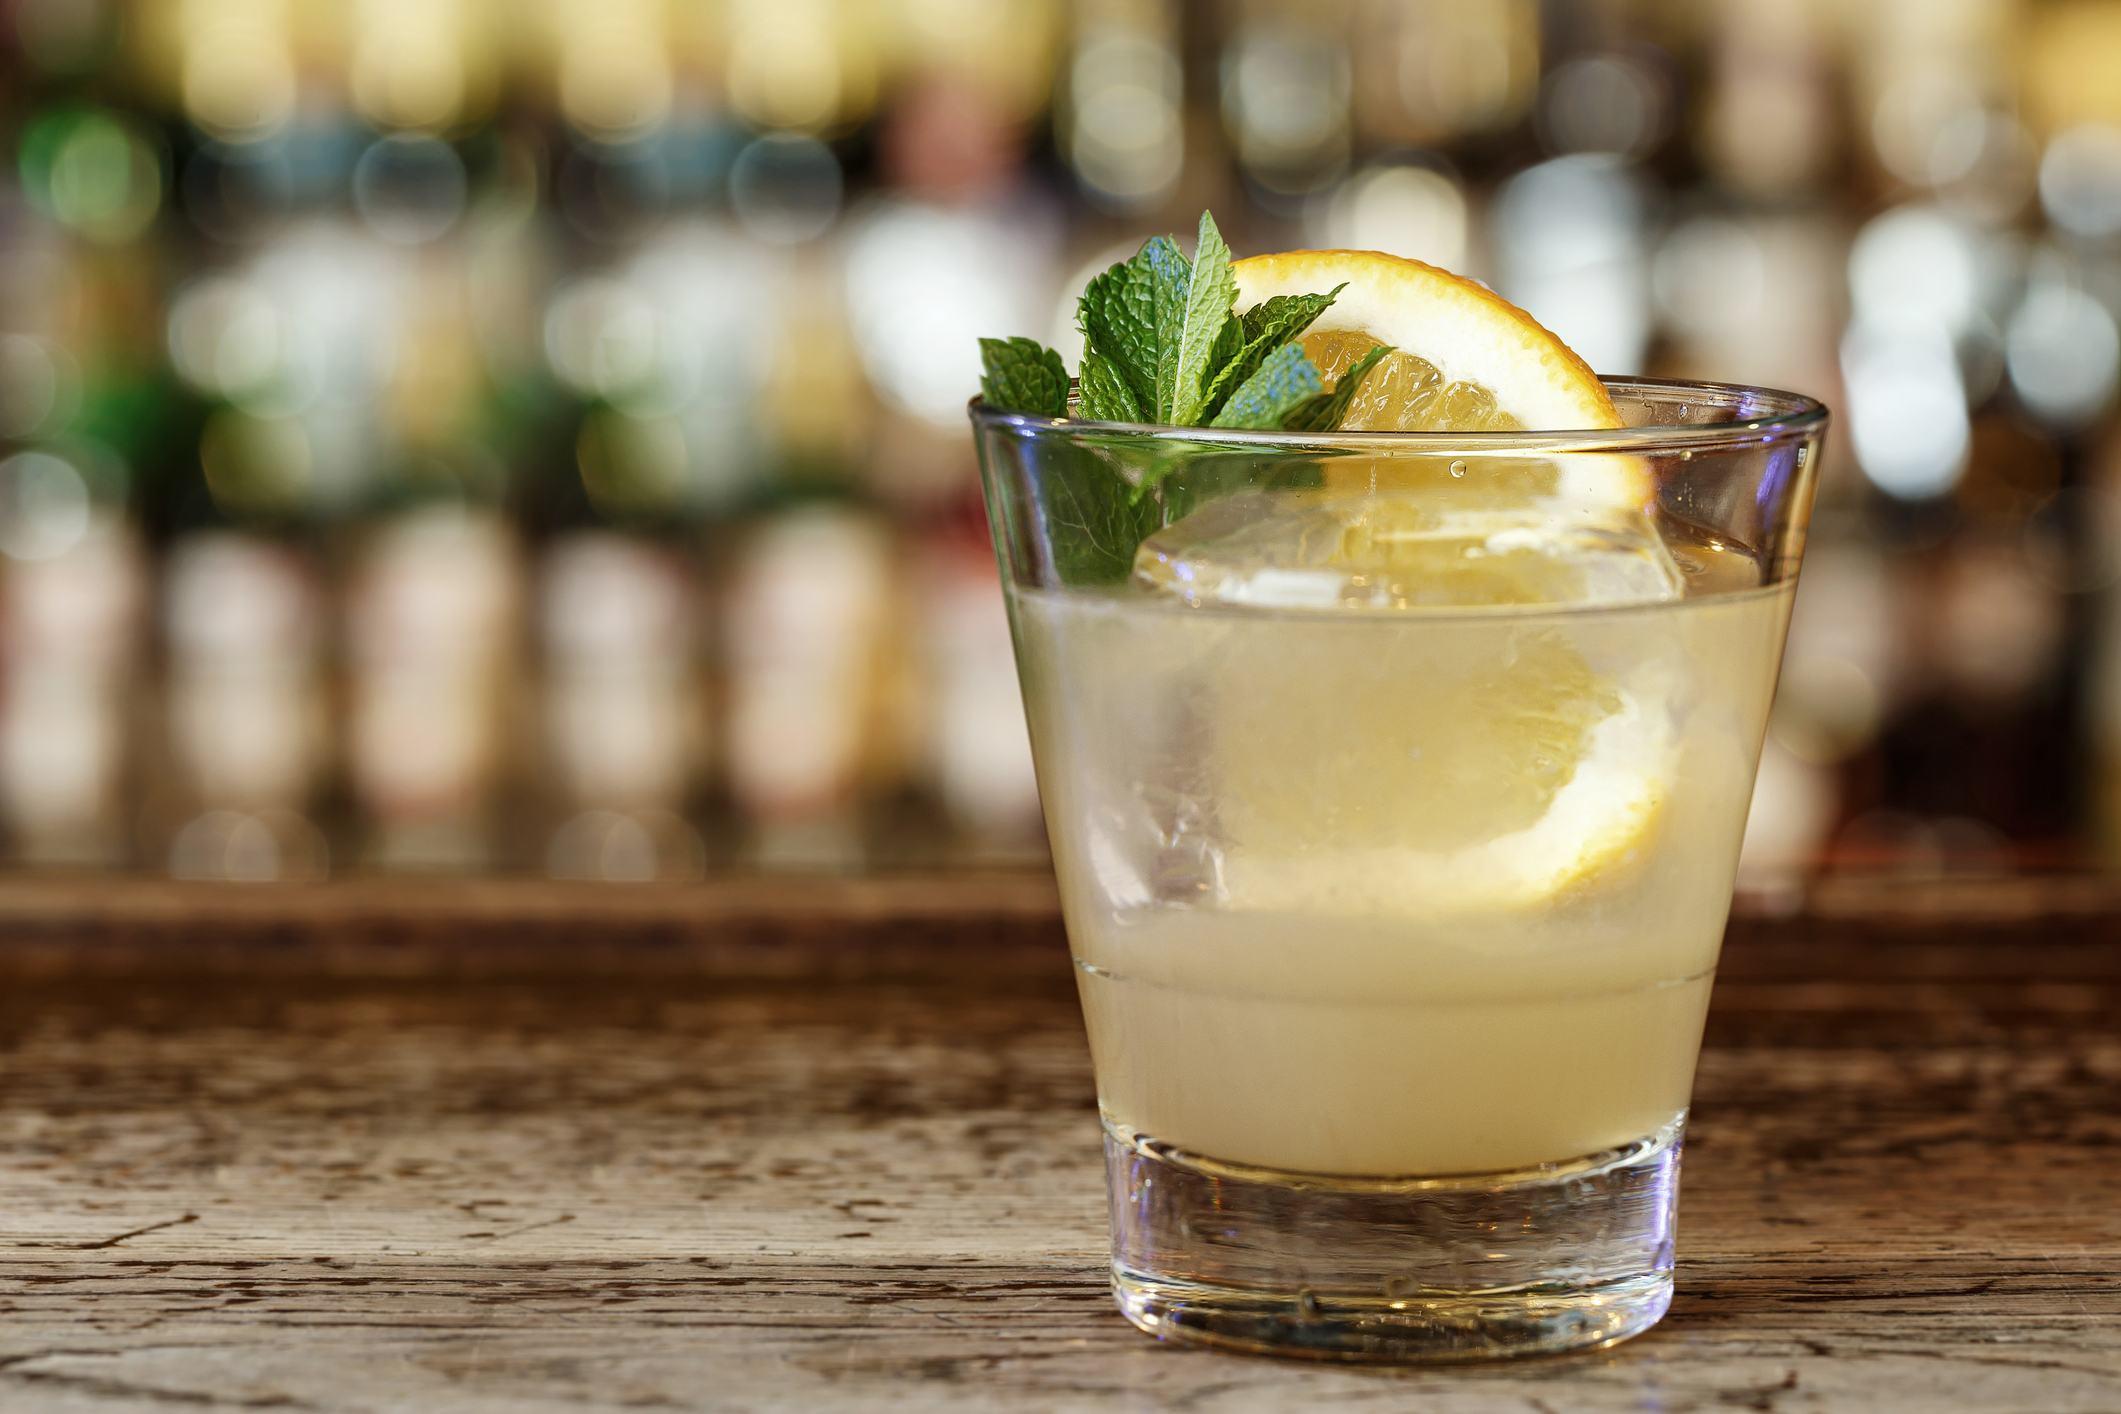 Classic American cocktail Southside based on gin, lemon juice, vodka